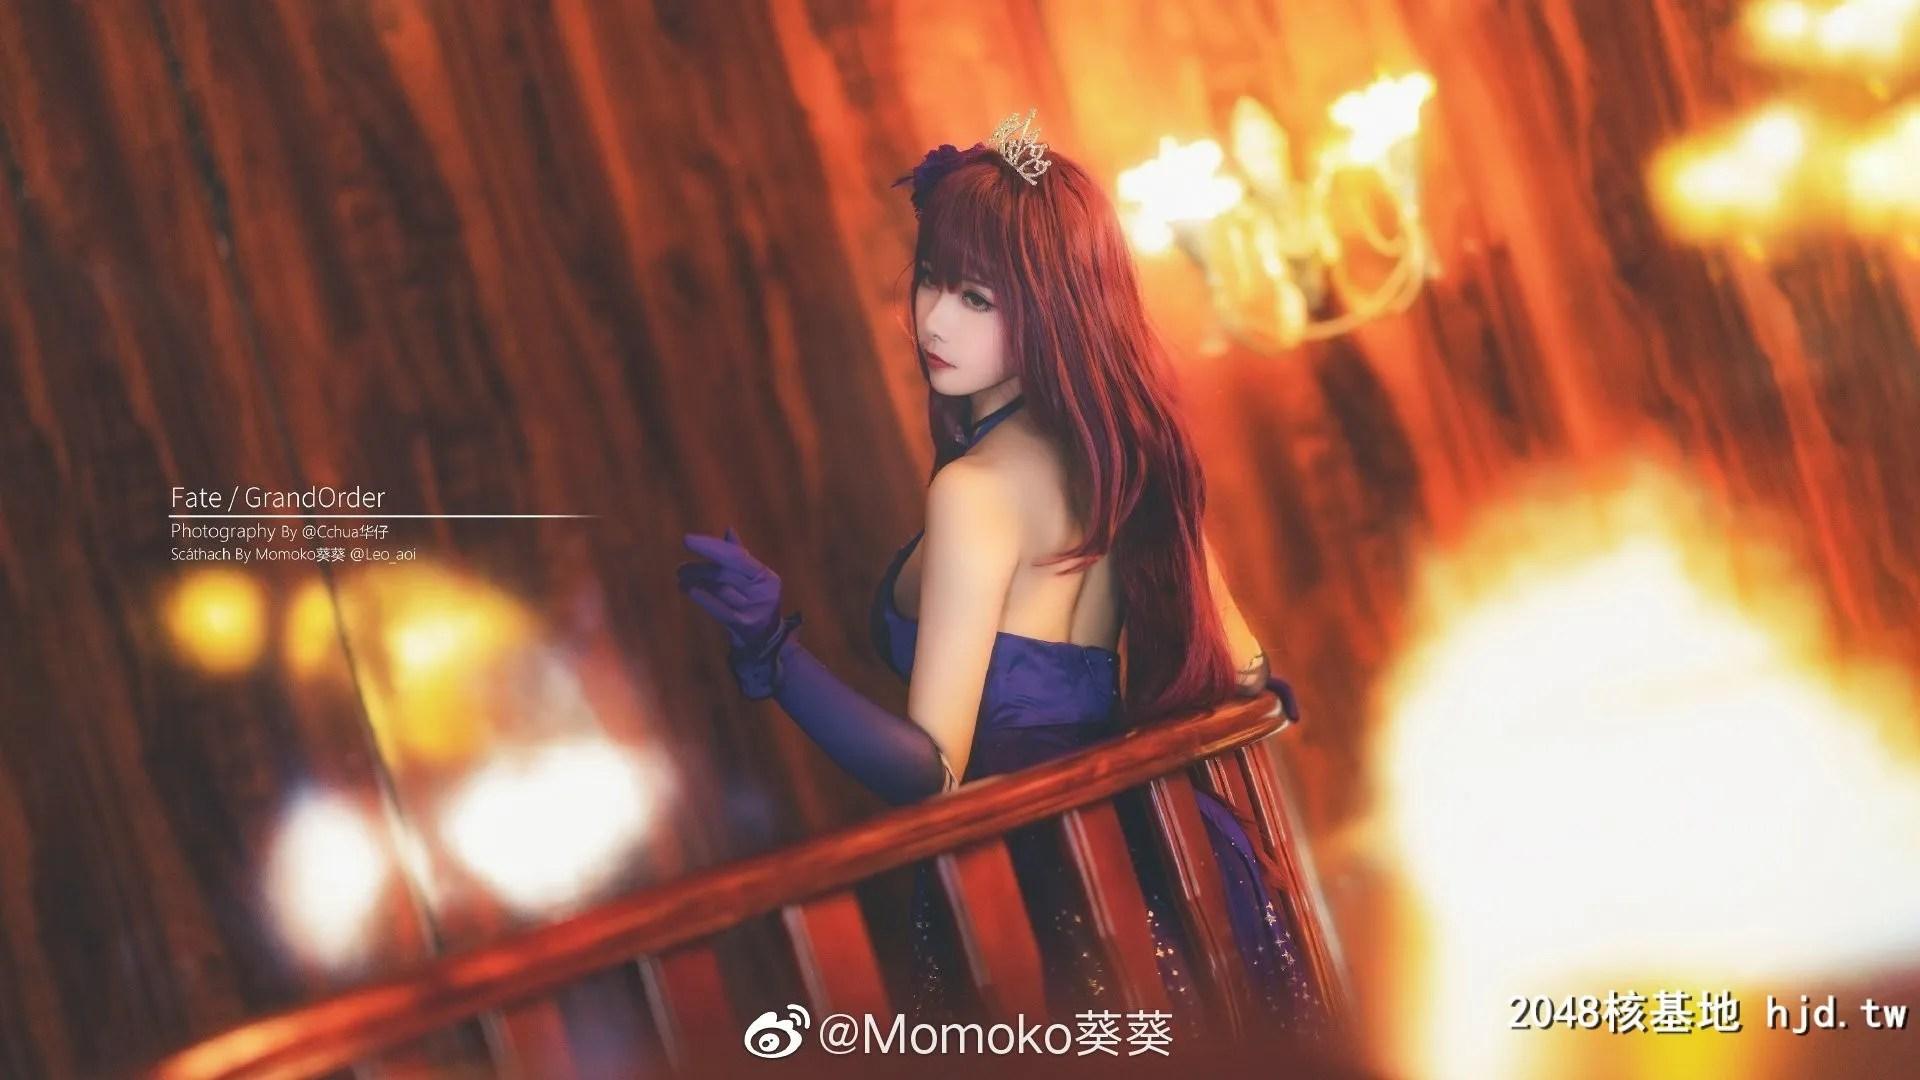 Fate/GrandOrder斯卡哈@Momoko葵葵 (10P)插图(6)